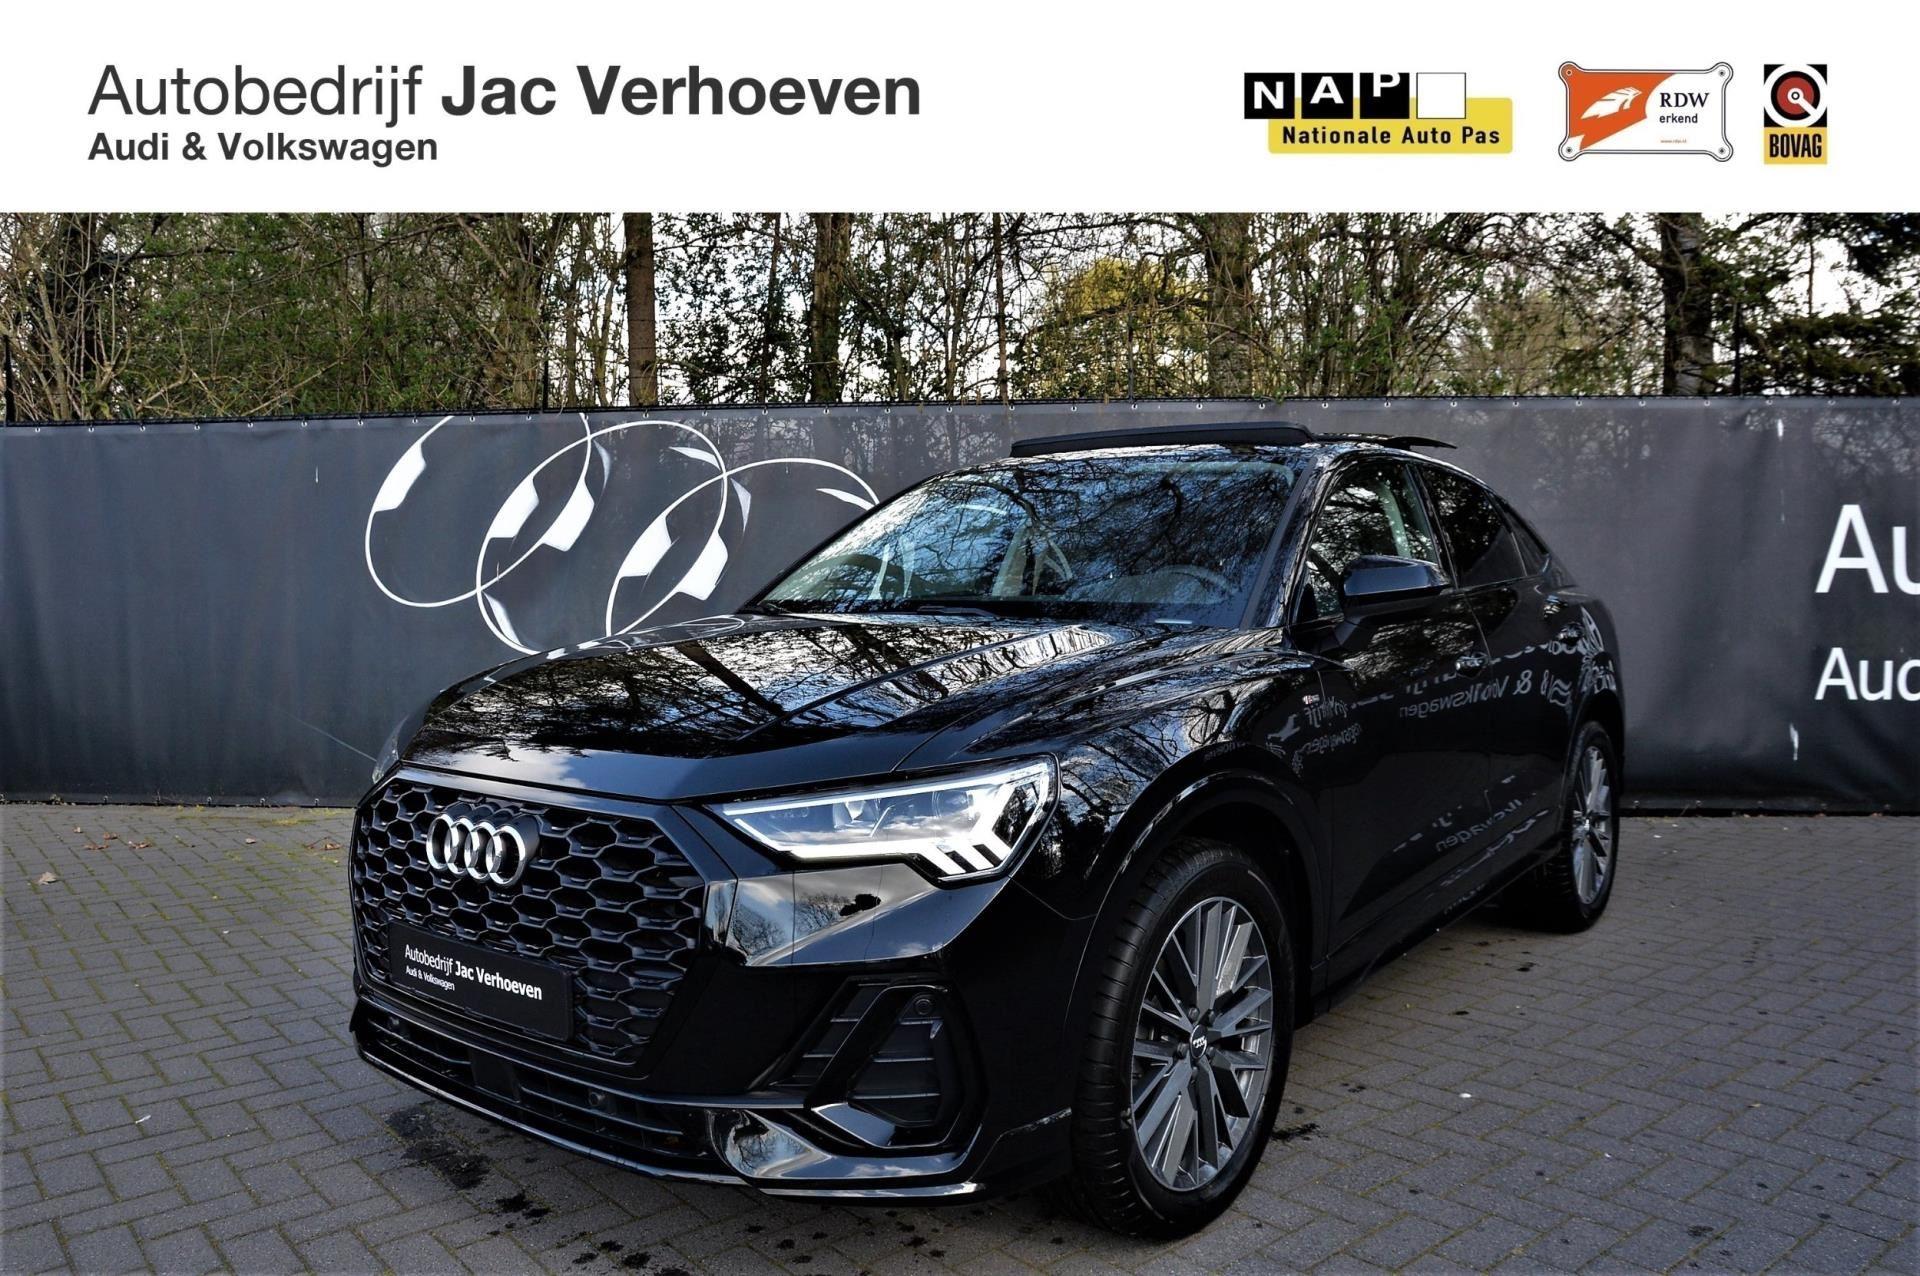 Audi Q3 Sportback occasion - Autobedrijf Jac Verhoeven